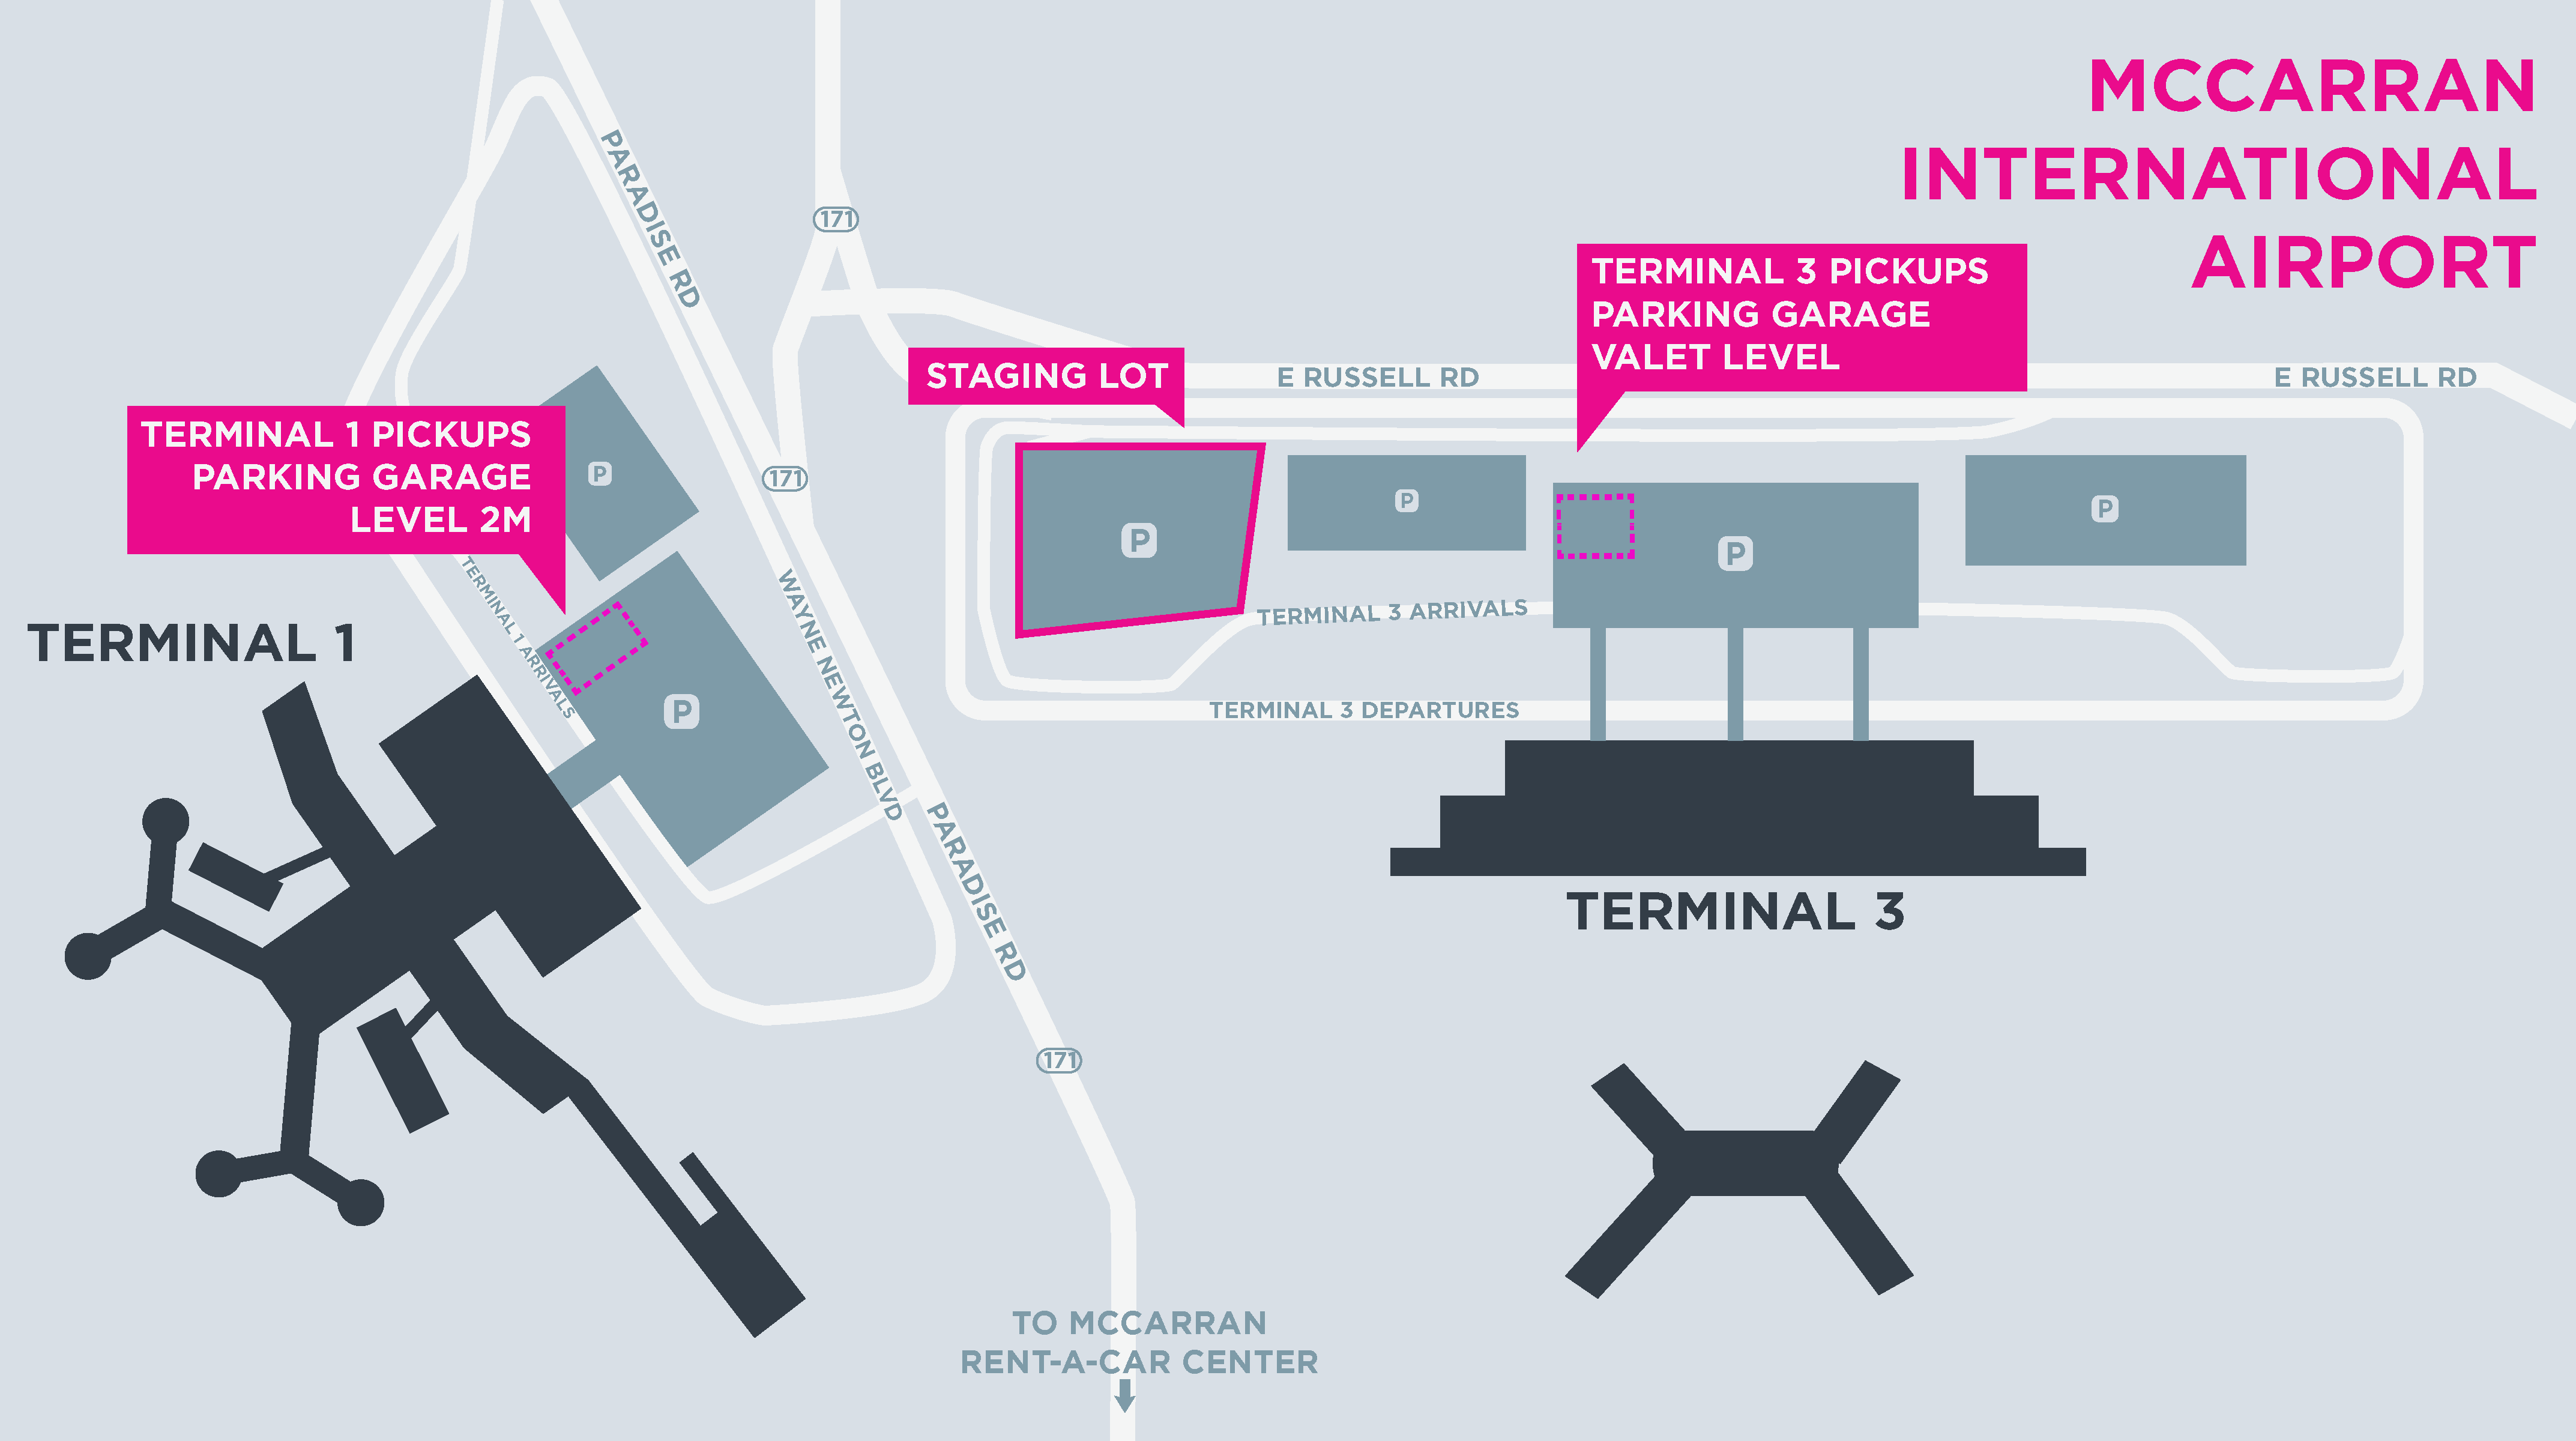 LAS Airport #LasVegas #casino #hotel #Strip #Lyft #Uber